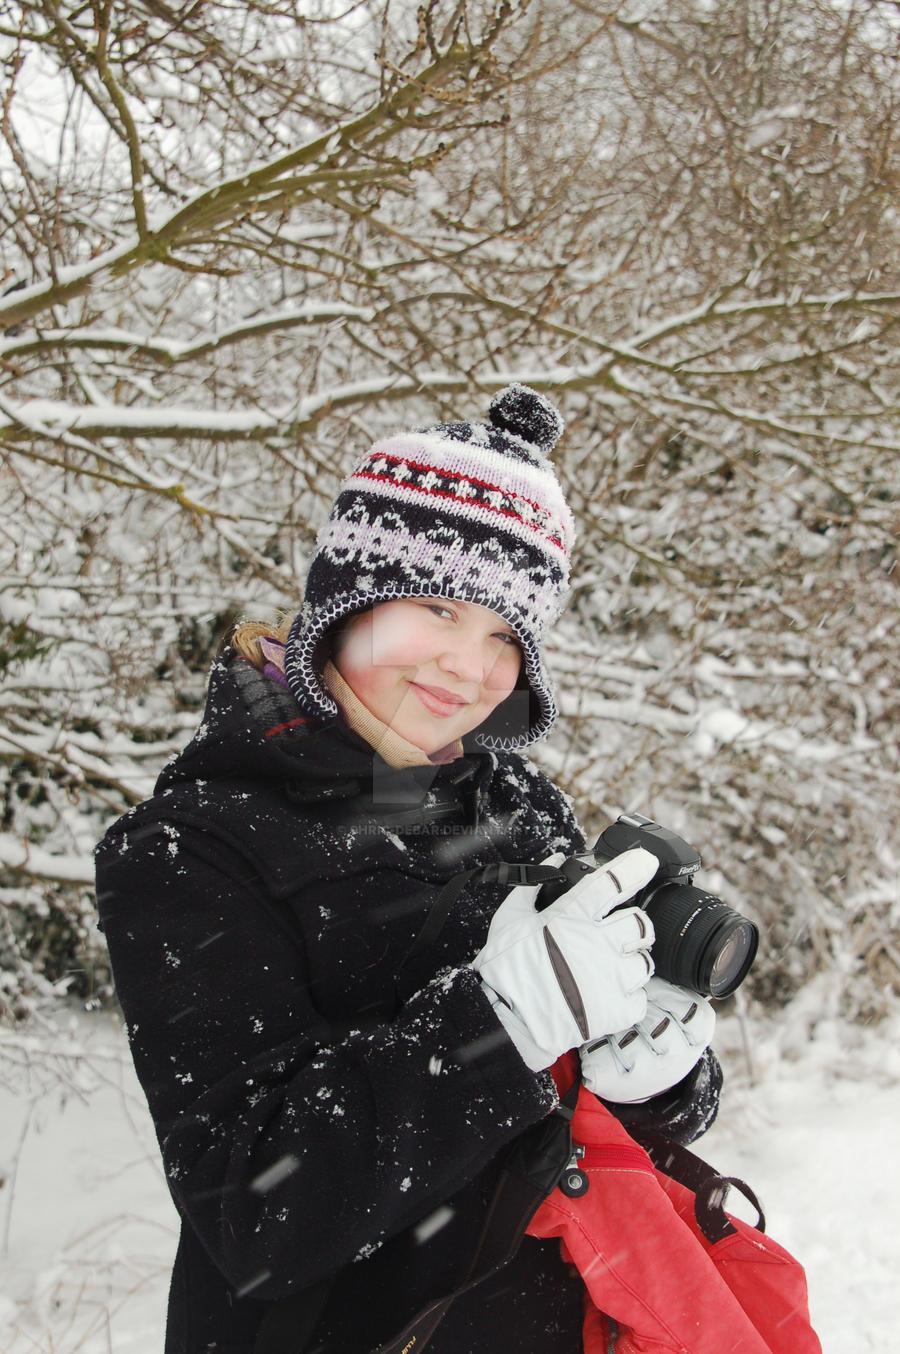 Snowy Photographer